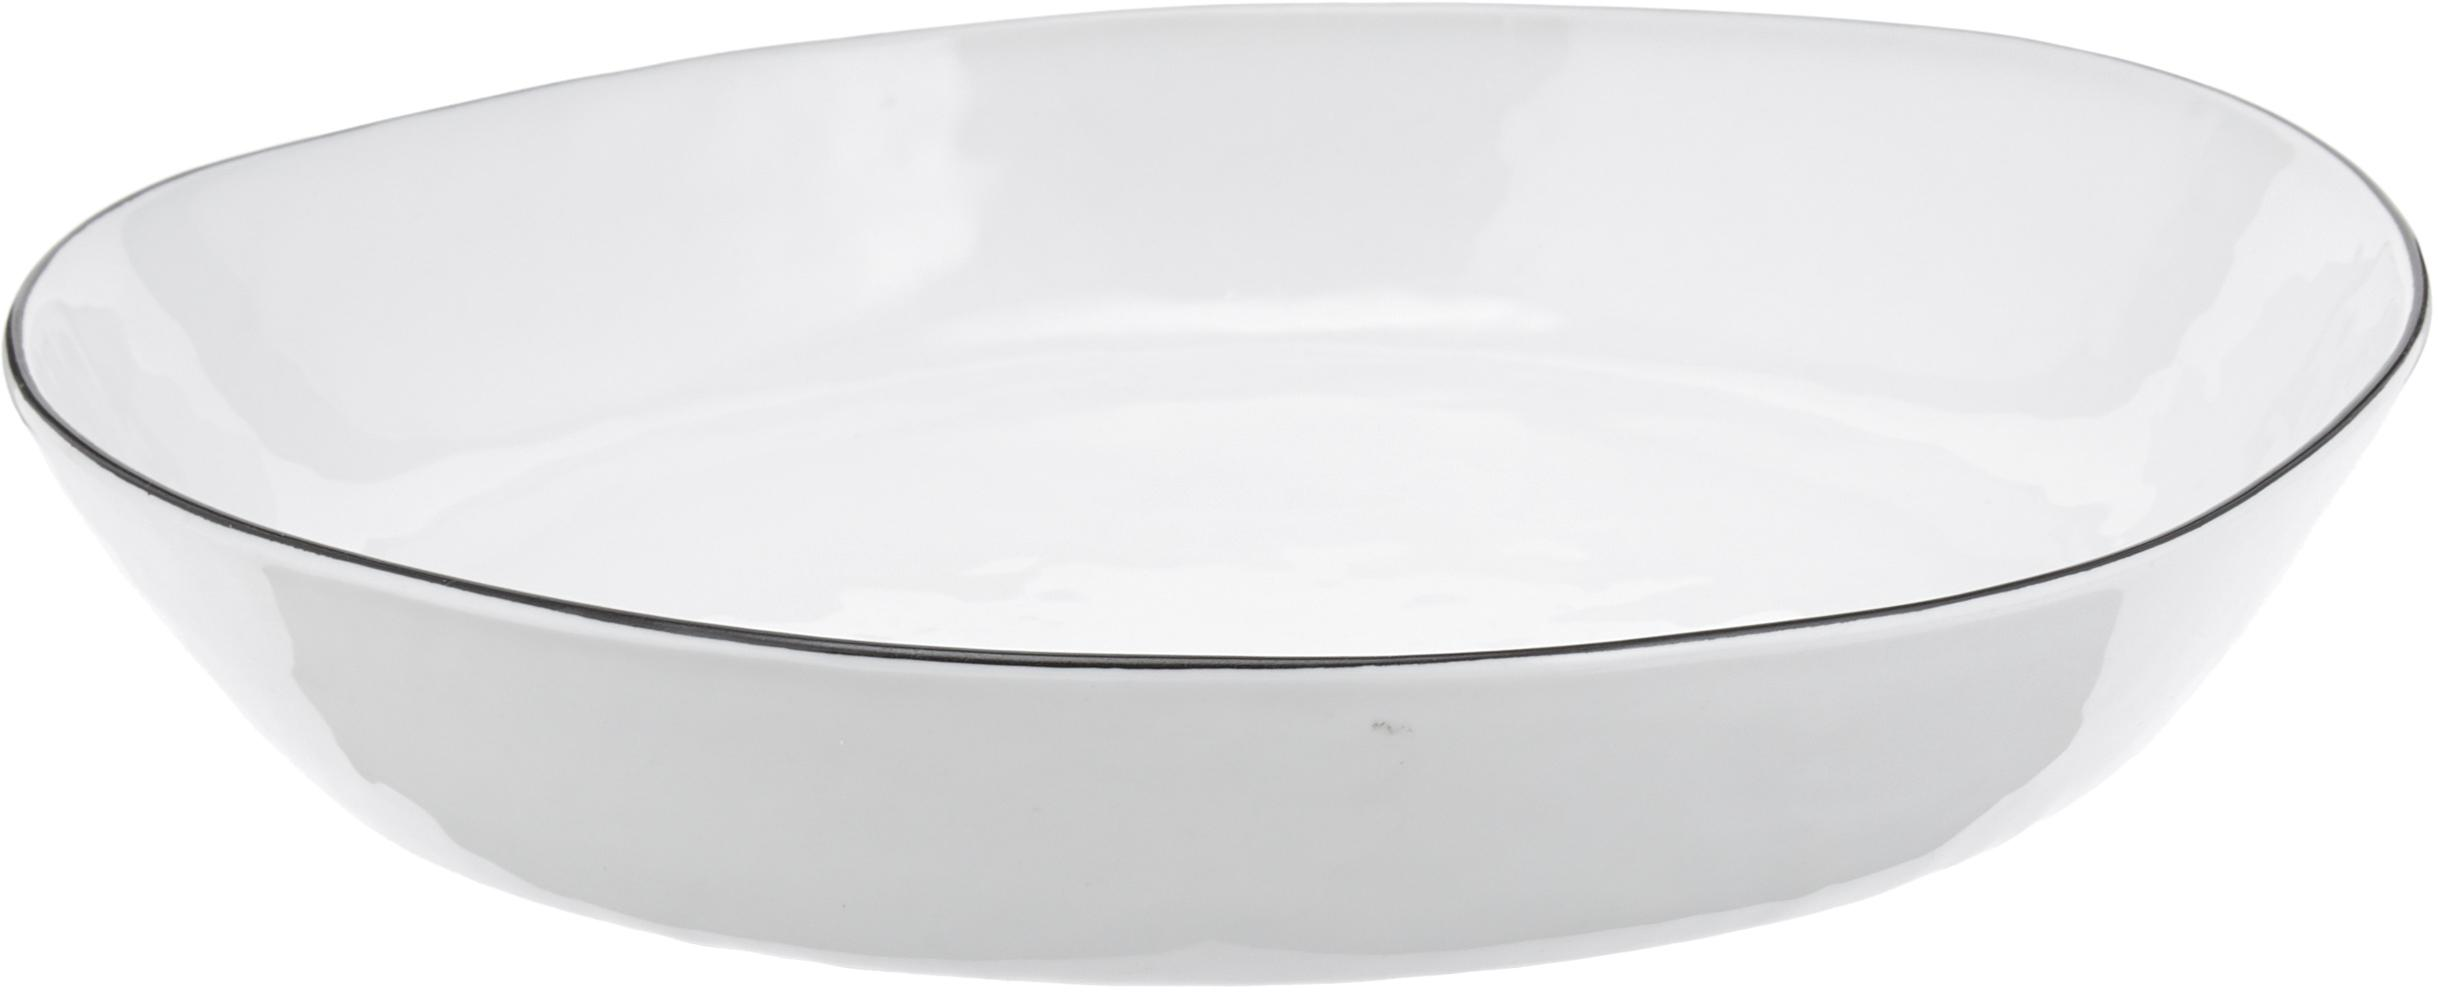 Ciotola fatta a mano Salt, Porcellana, Bianco latteo, nero, Larg. 24 x Alt. 4 cm